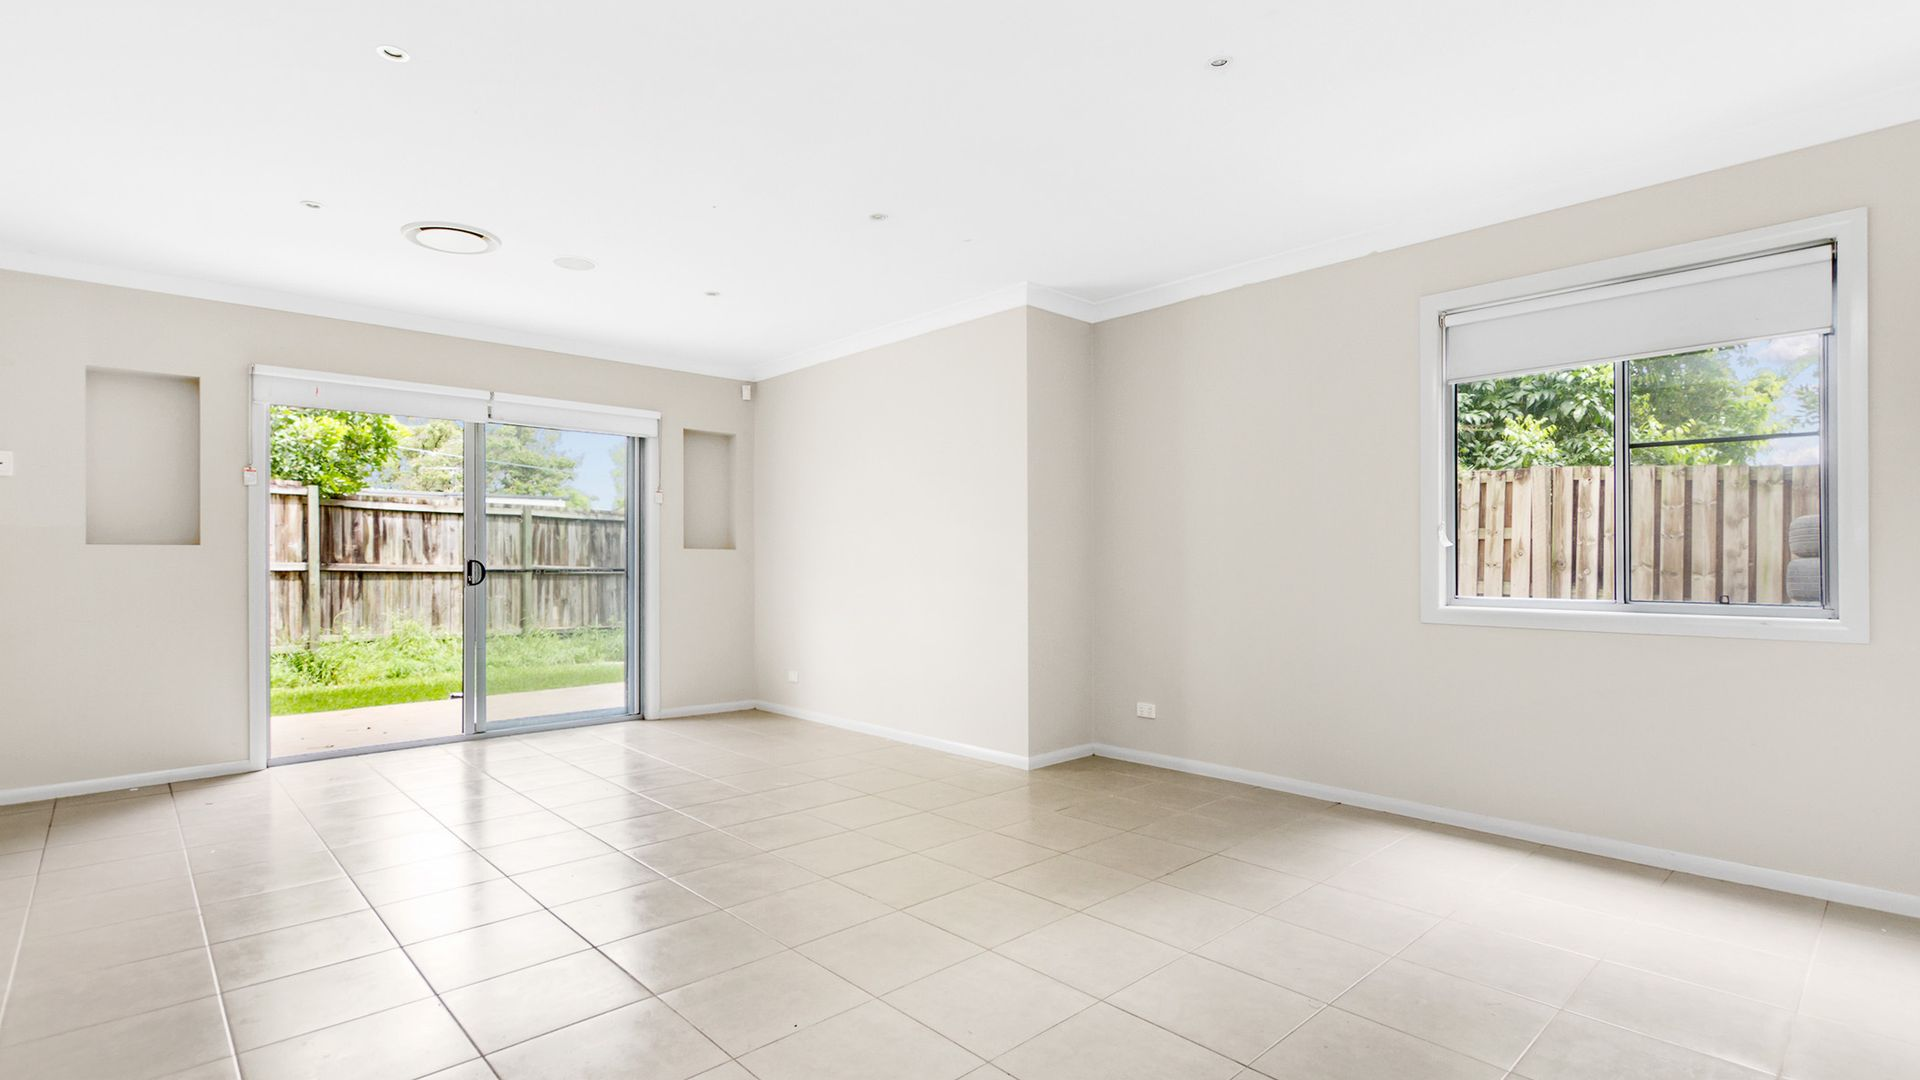 38/7-17 Lucy Street, Marsden QLD 4132, Image 2